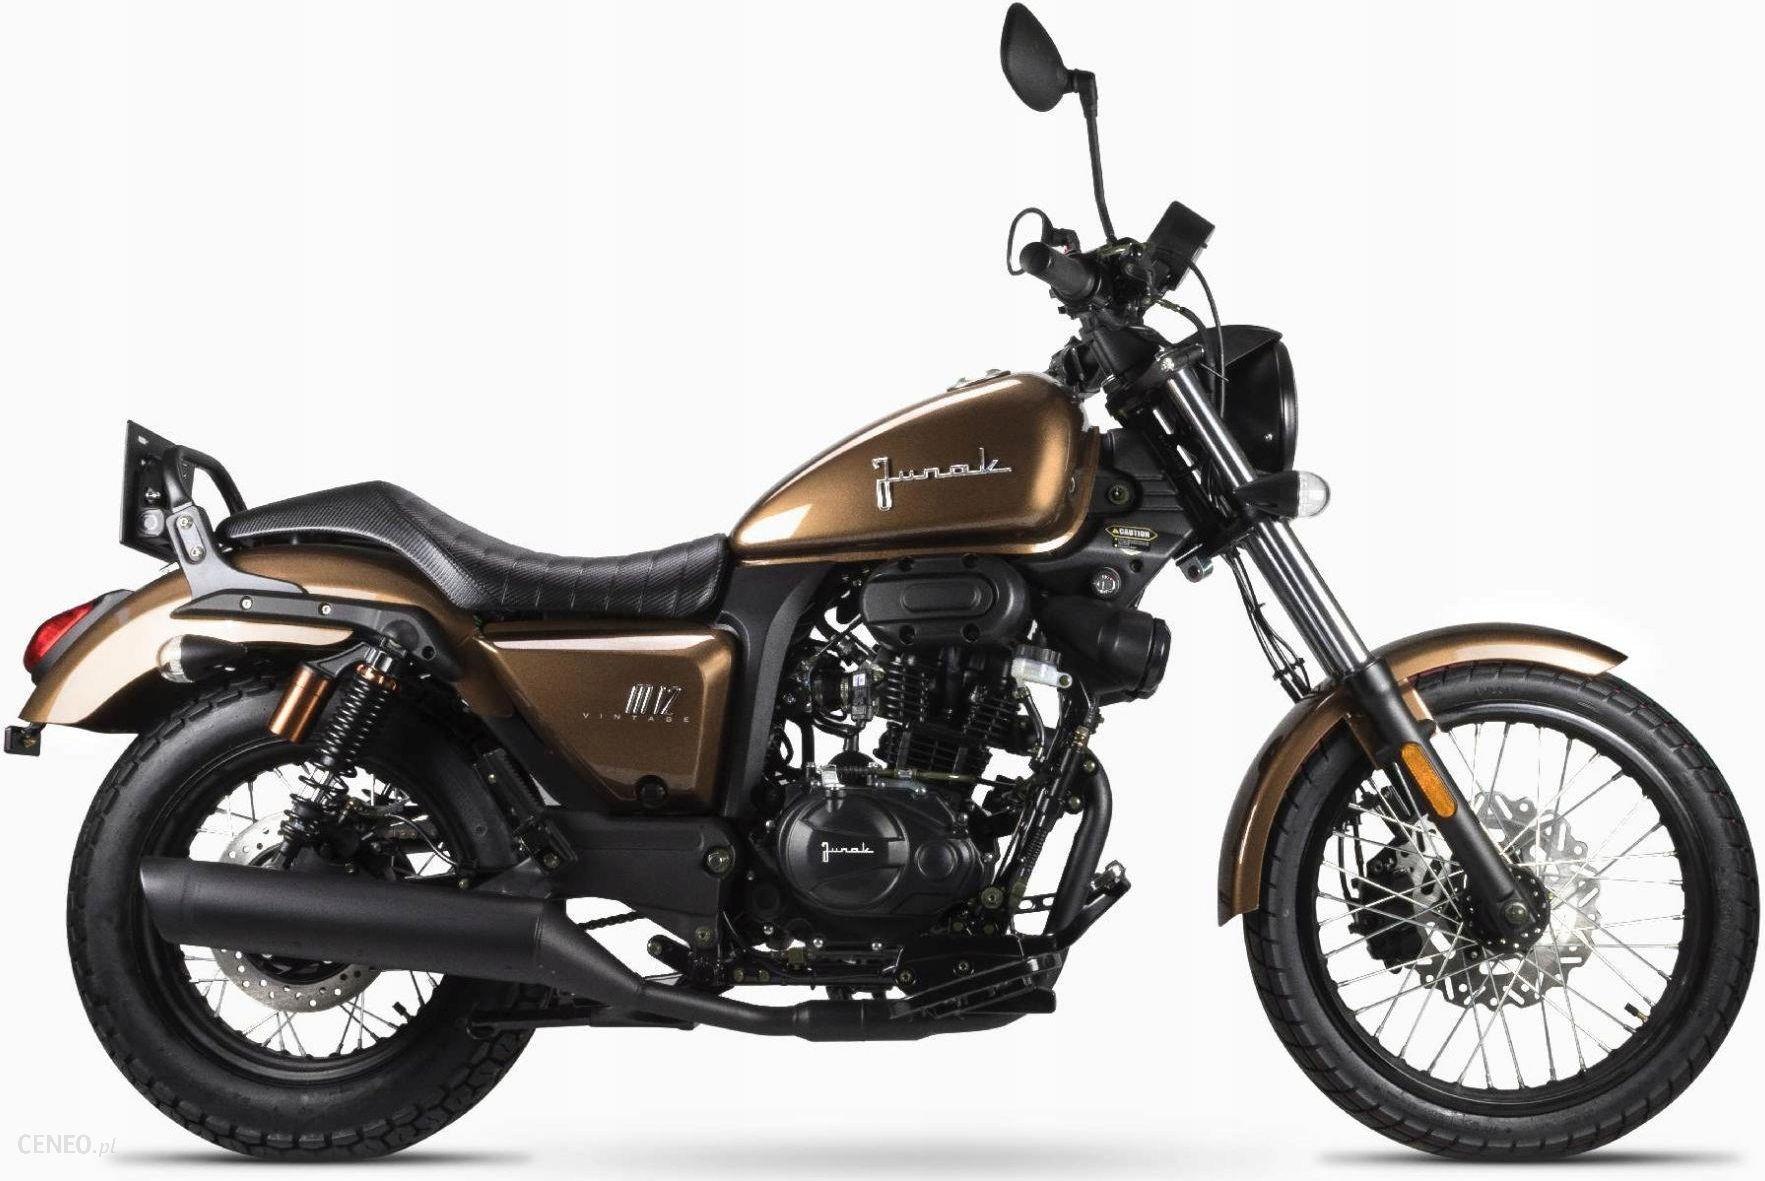 Motocykl Junak M12 Vintage 125 Cm3 Opinie I Ceny Na Ceneo Pl